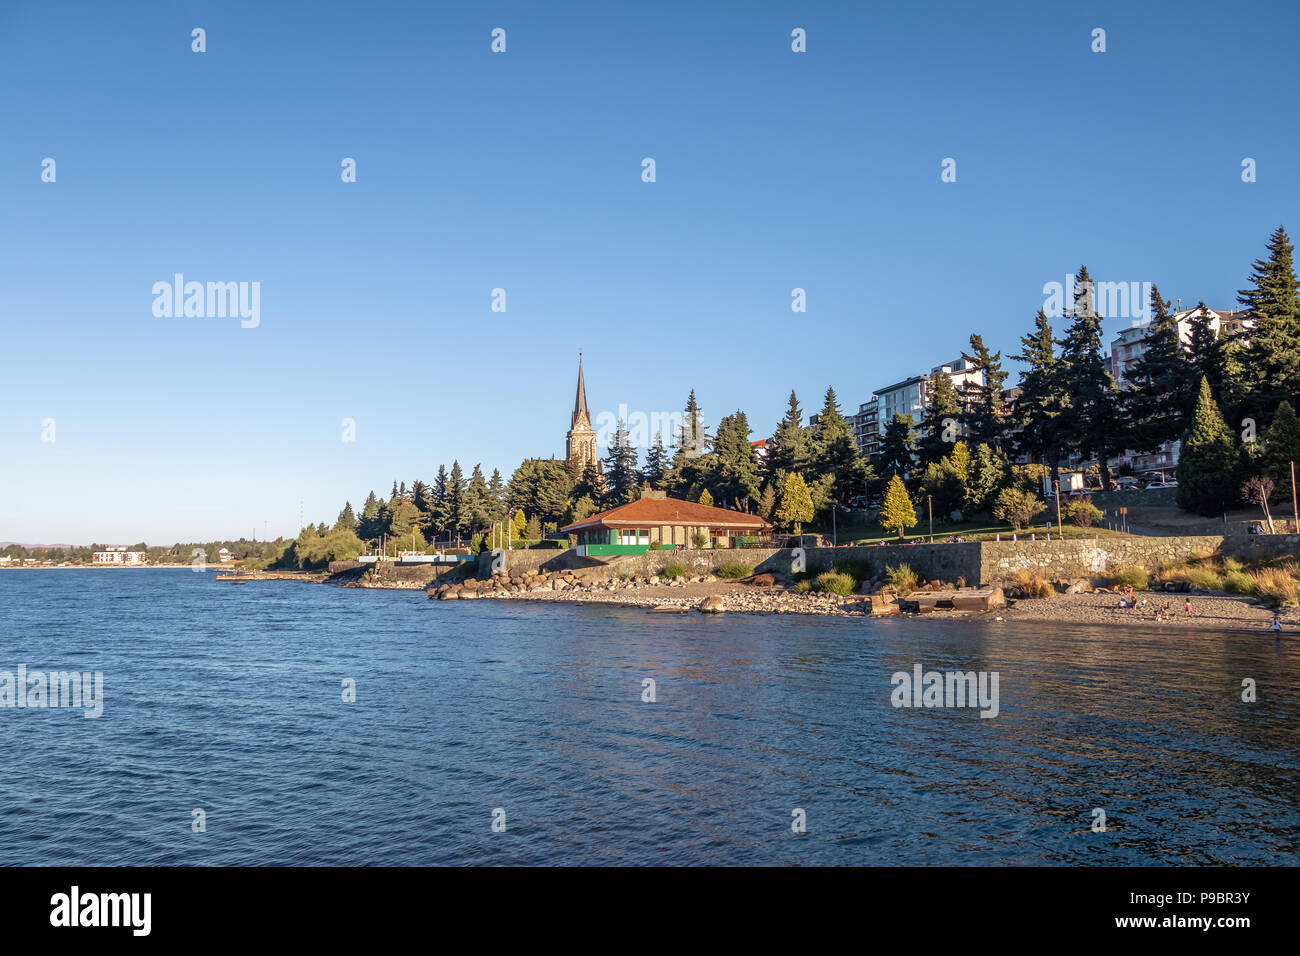 Bariloche skyline and Nahuel Huapi Lake - Bariloche, Patagonia, Argentina - Stock Image